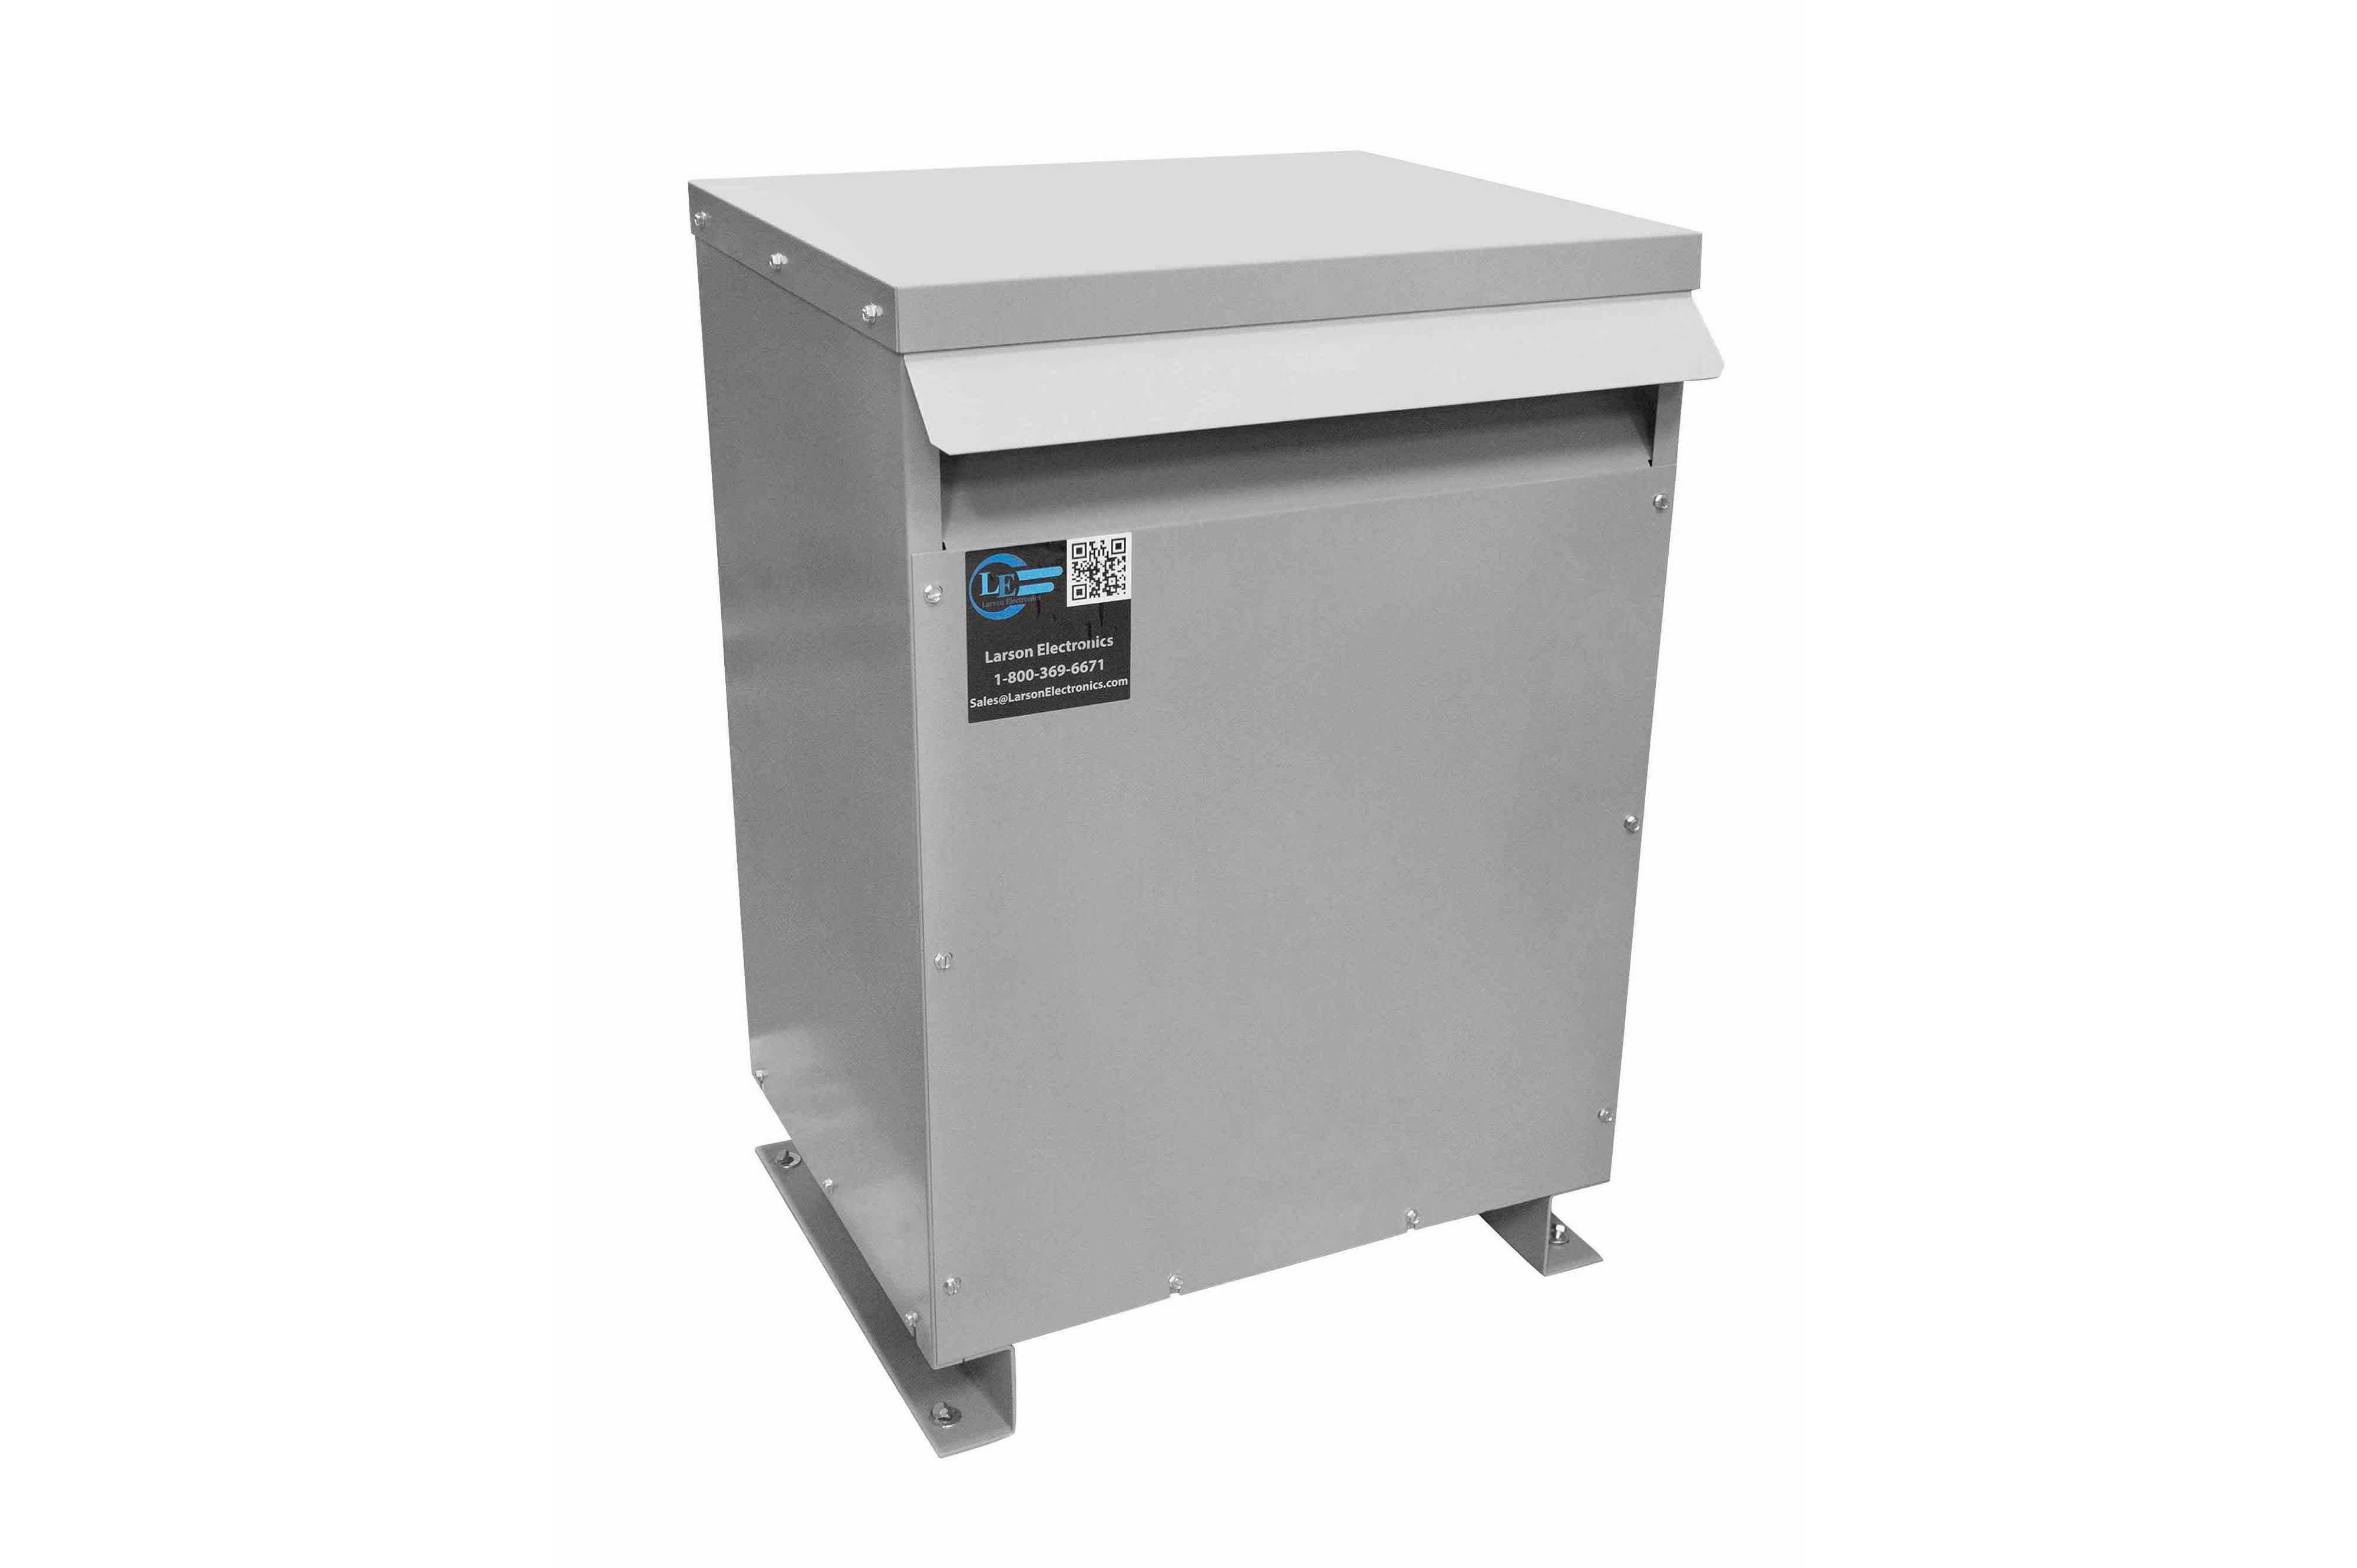 300 kVA 3PH DOE Transformer, 460V Delta Primary, 575Y/332 Wye-N Secondary, N3R, Ventilated, 60 Hz